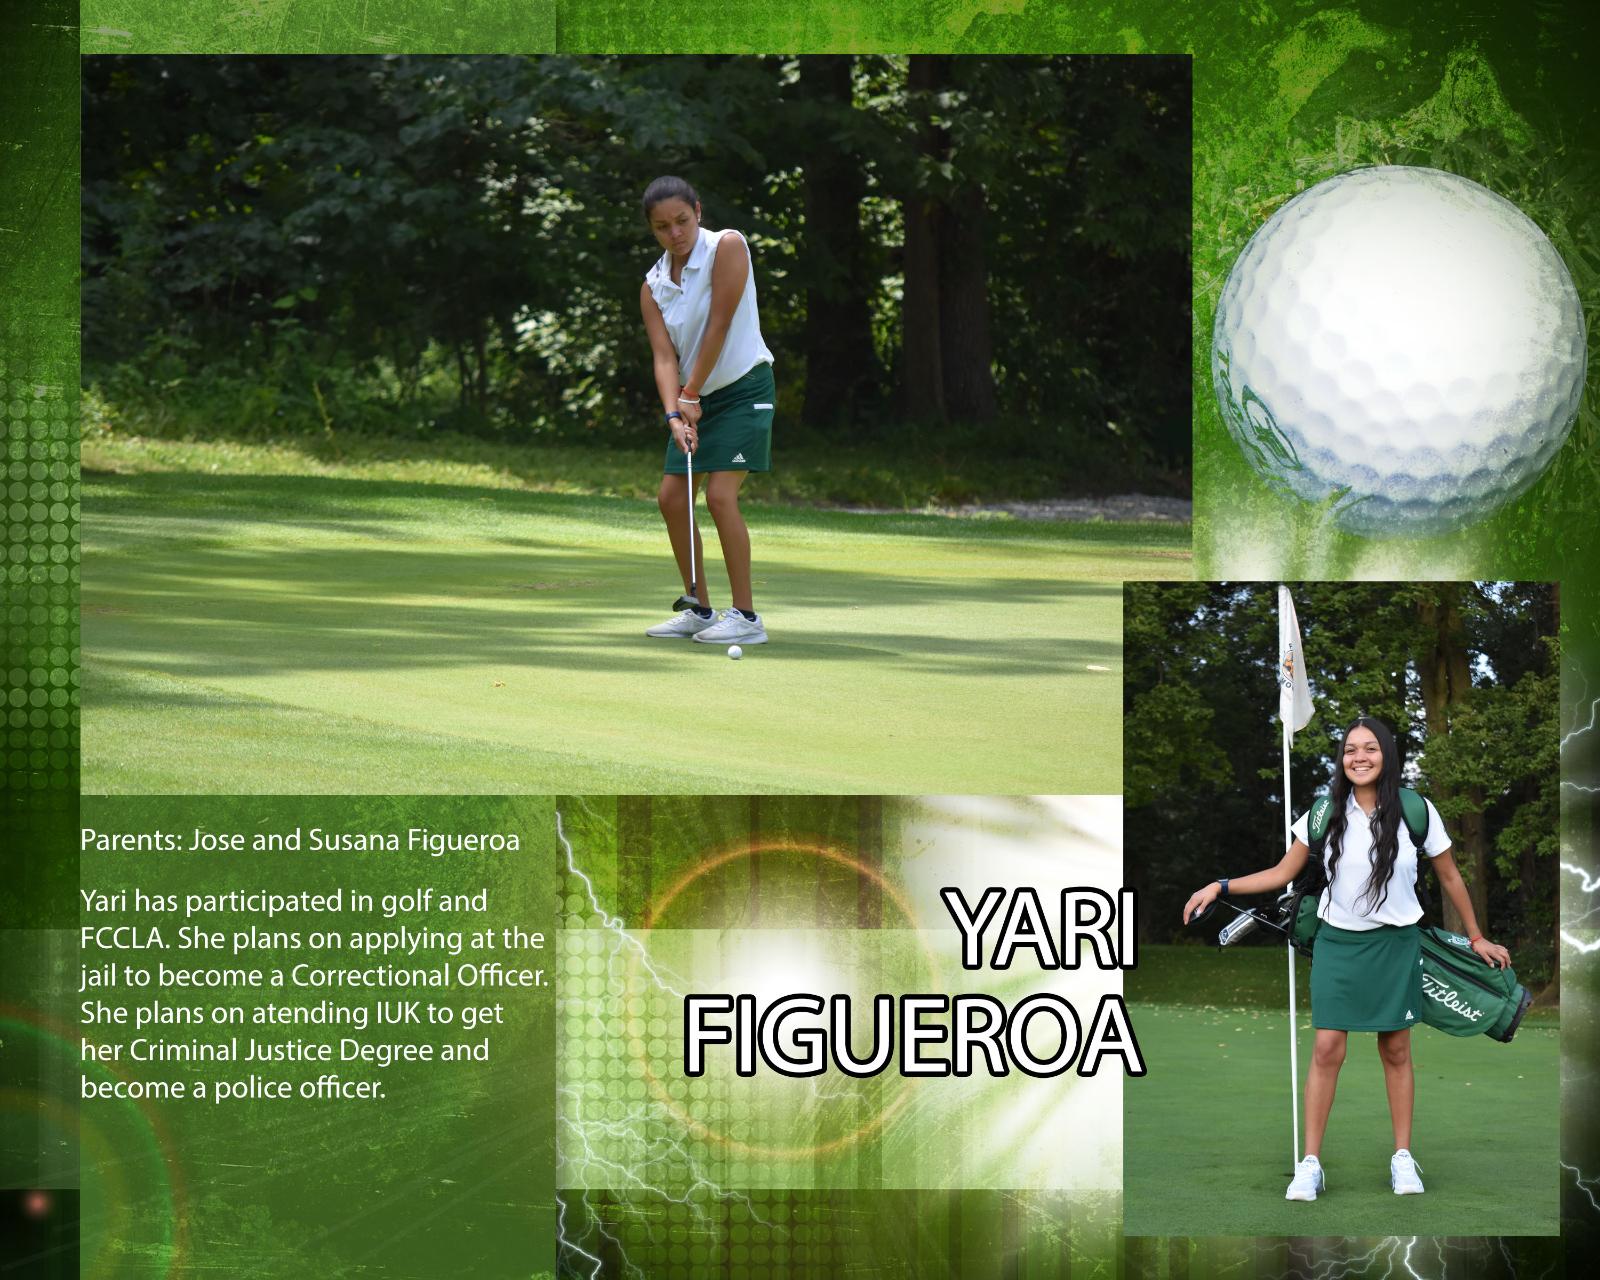 Senior Girls Golfer – Yari Figueroa